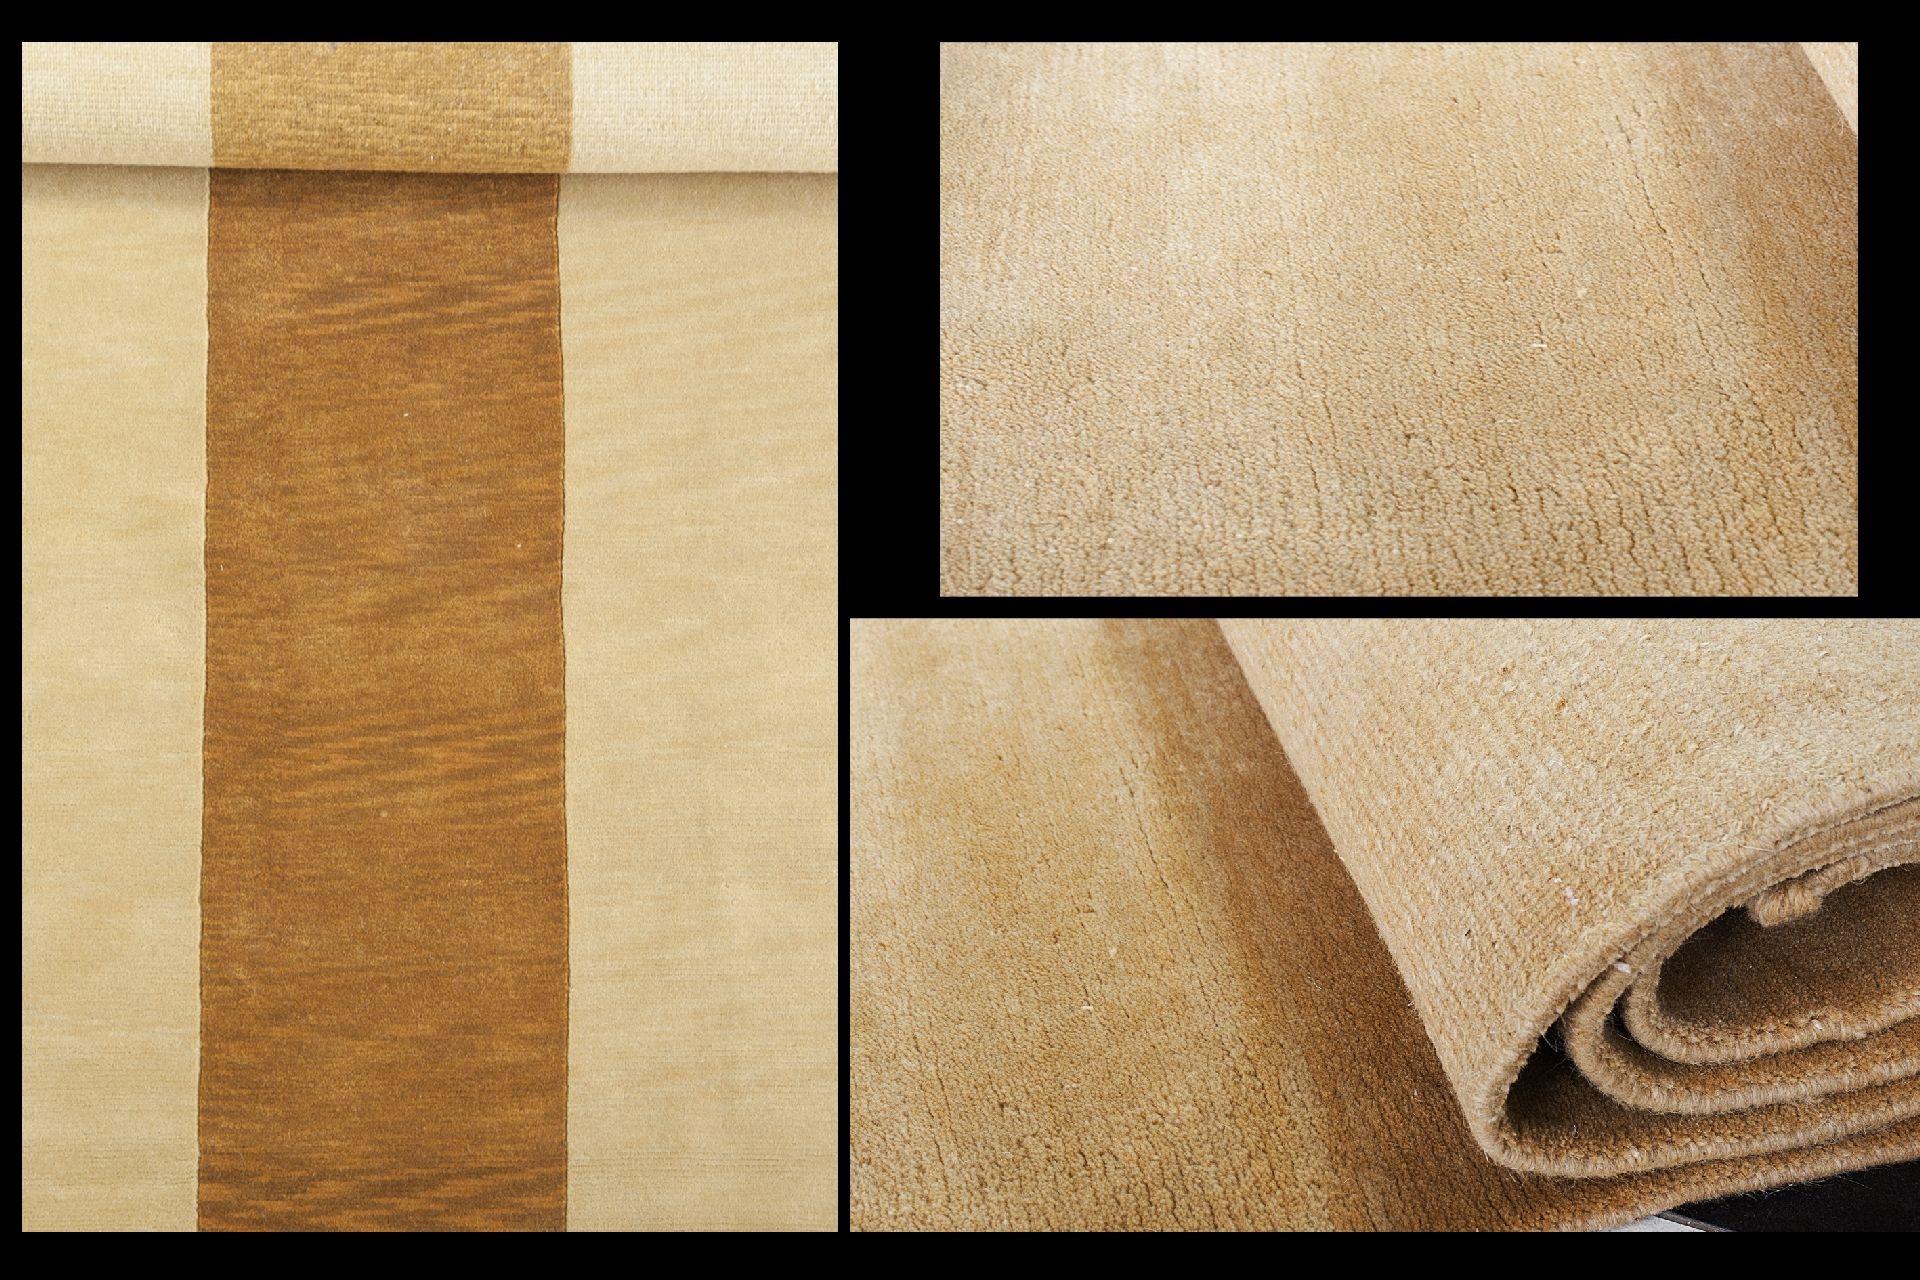 Tappeto di lana gcm modello twin colore beige camel 170x240cm in 100 lana tappeti a prezzi - Tappeti in lana moderni ...